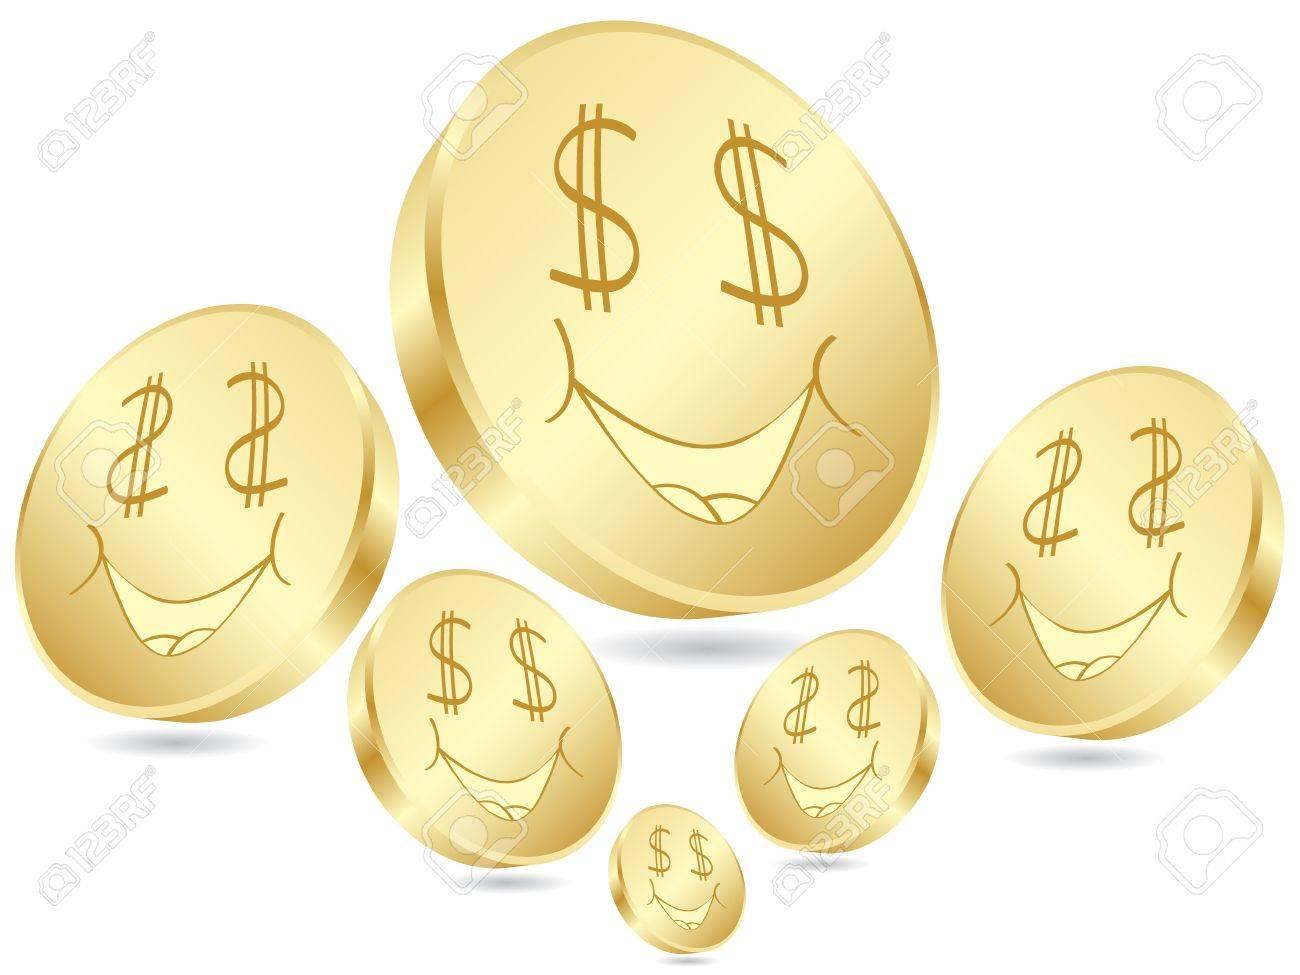 dollar coins poster Stock Vector - 10496902